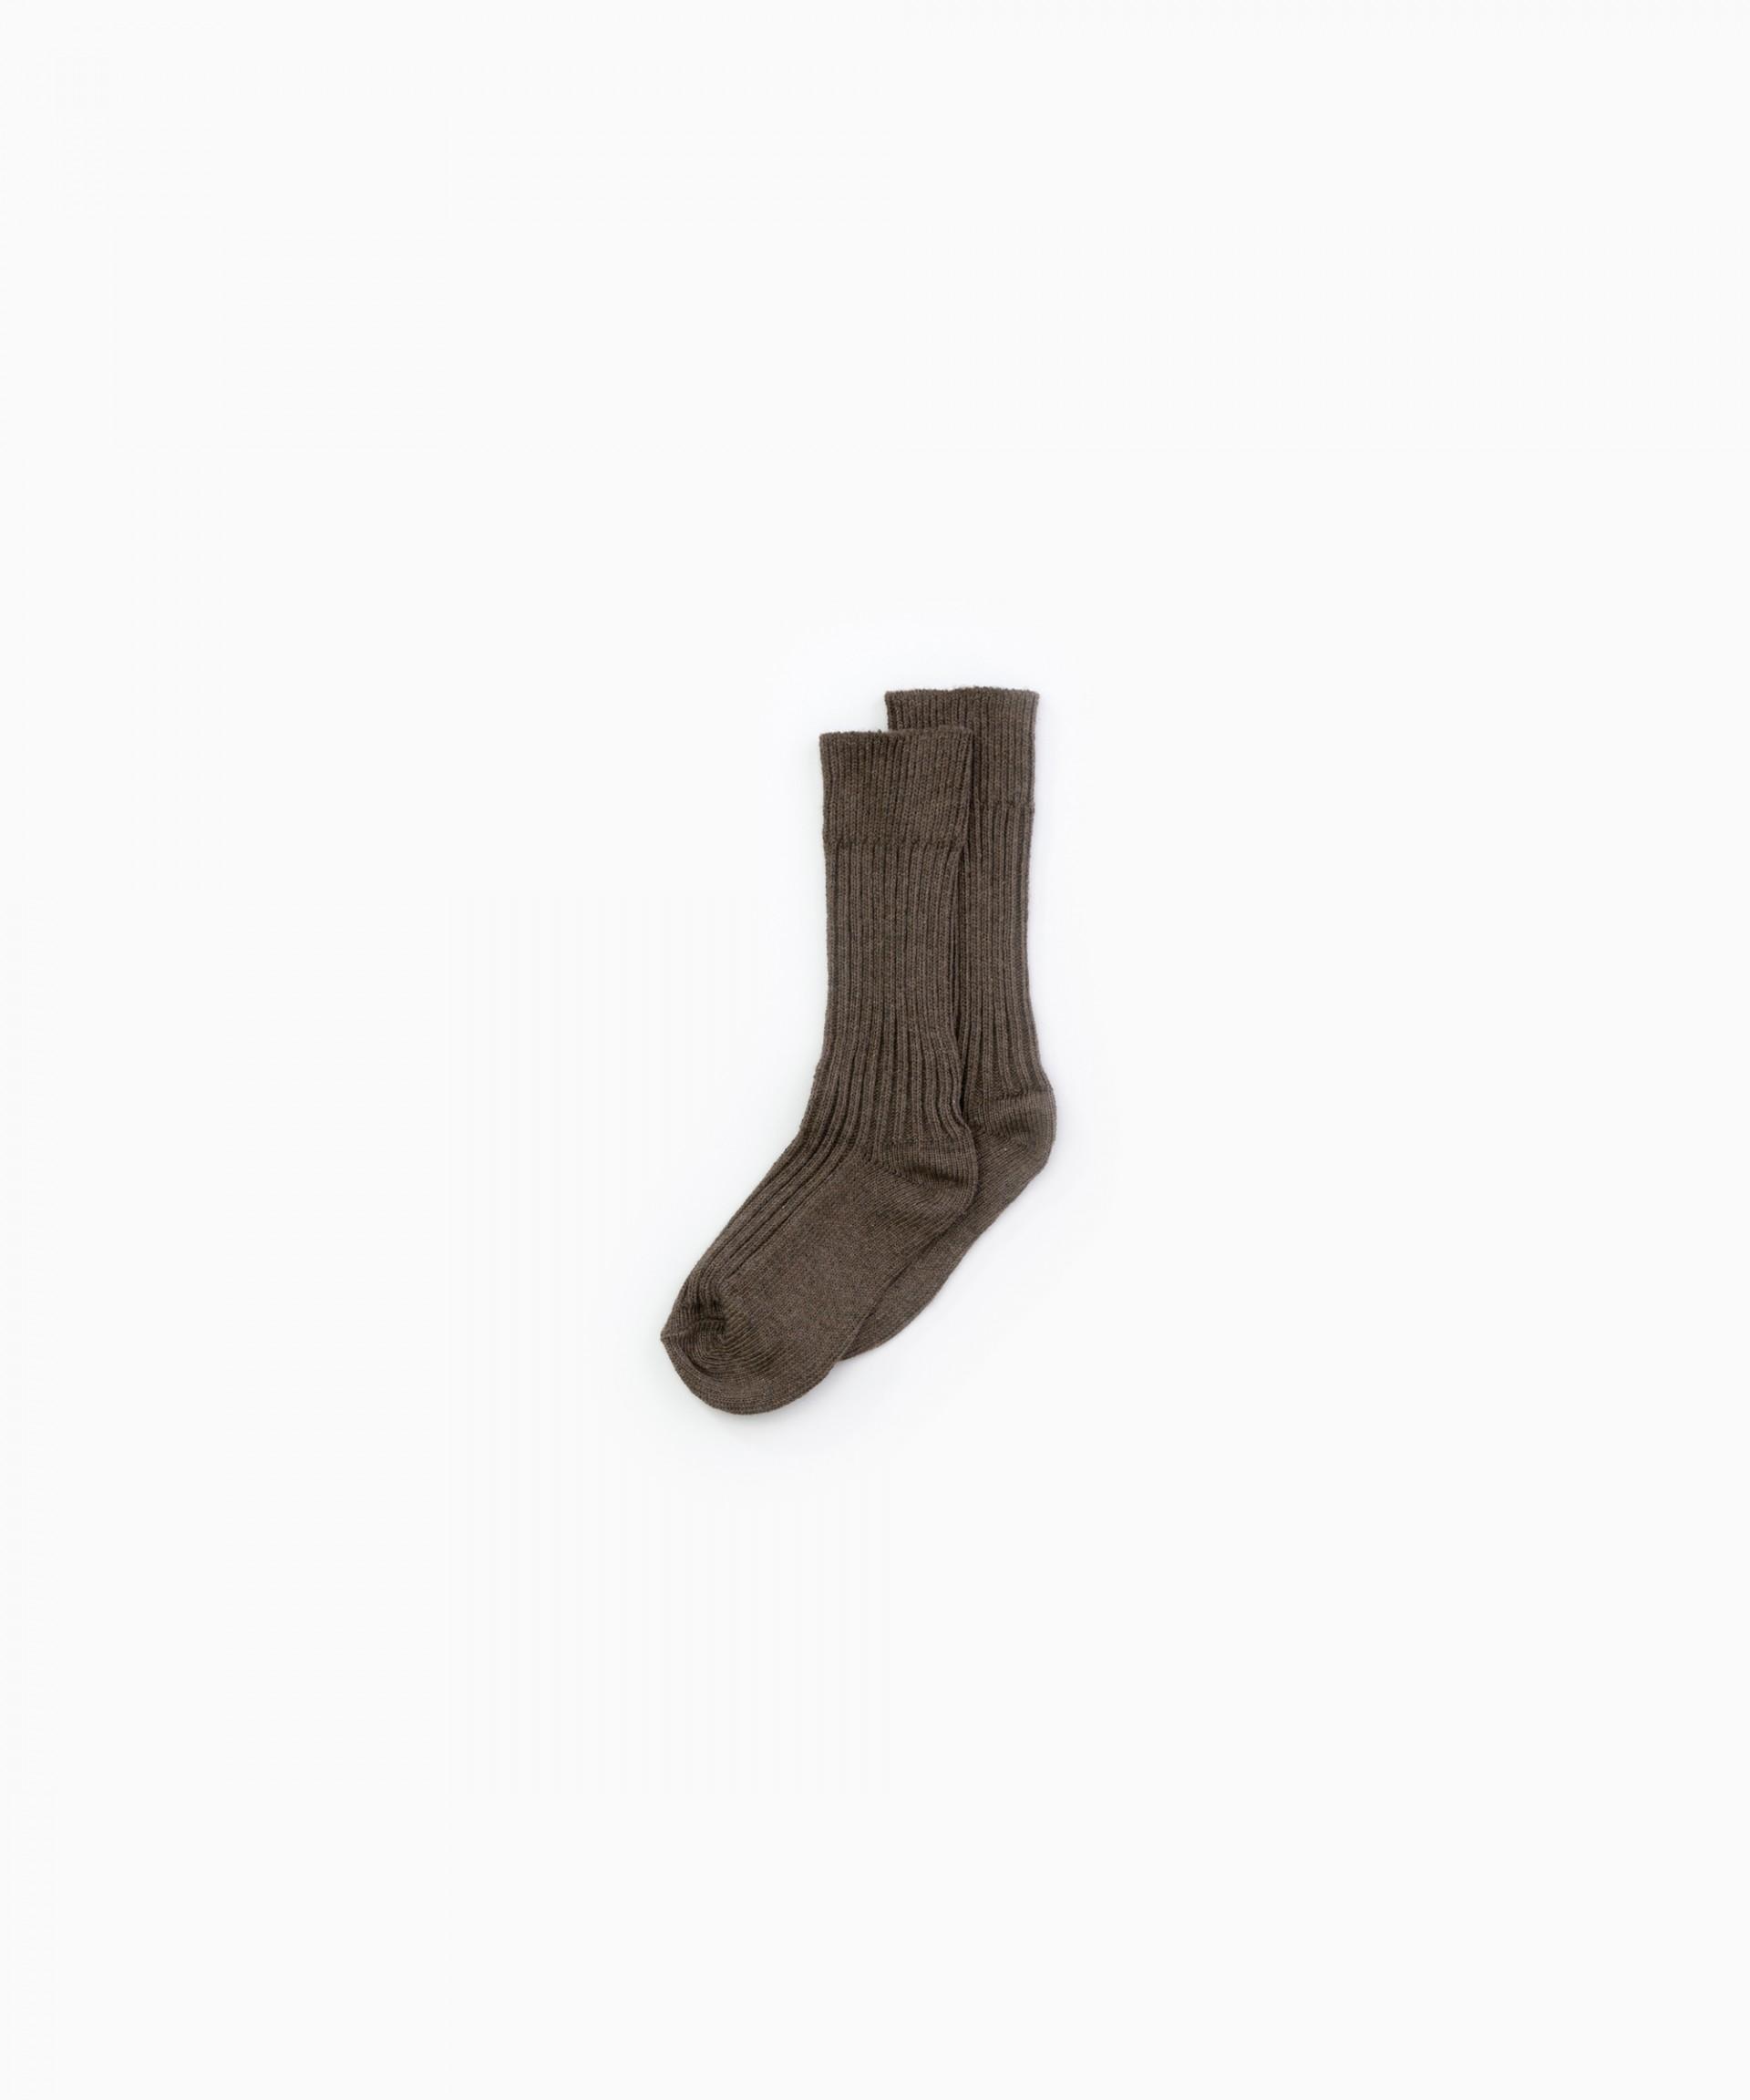 Long socks | Woodwork